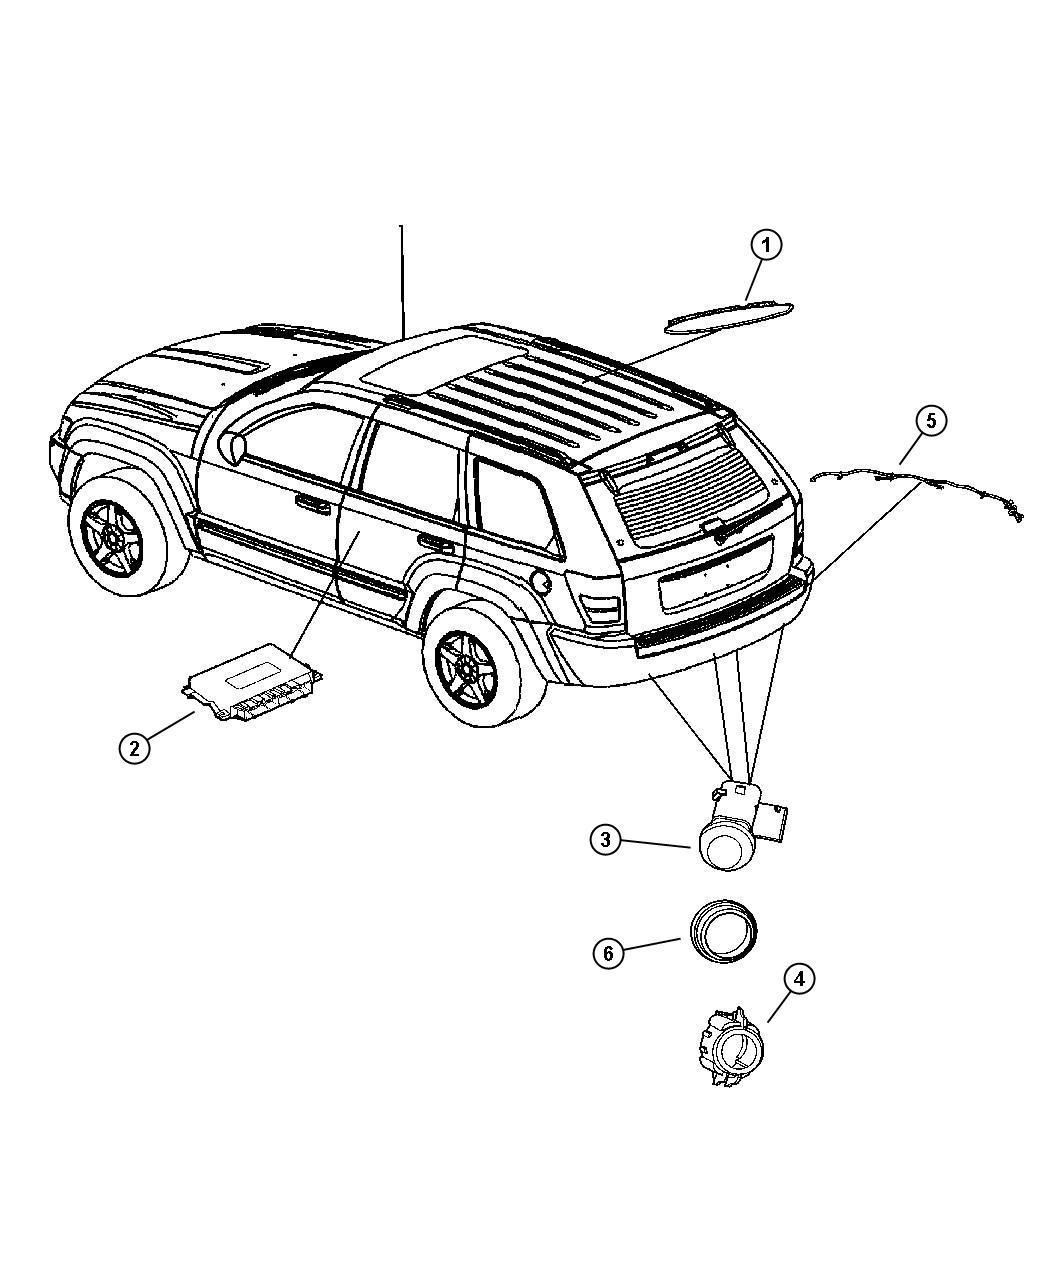 2013 Dodge Challenger Harness, wiring. Rear fascia, sensor